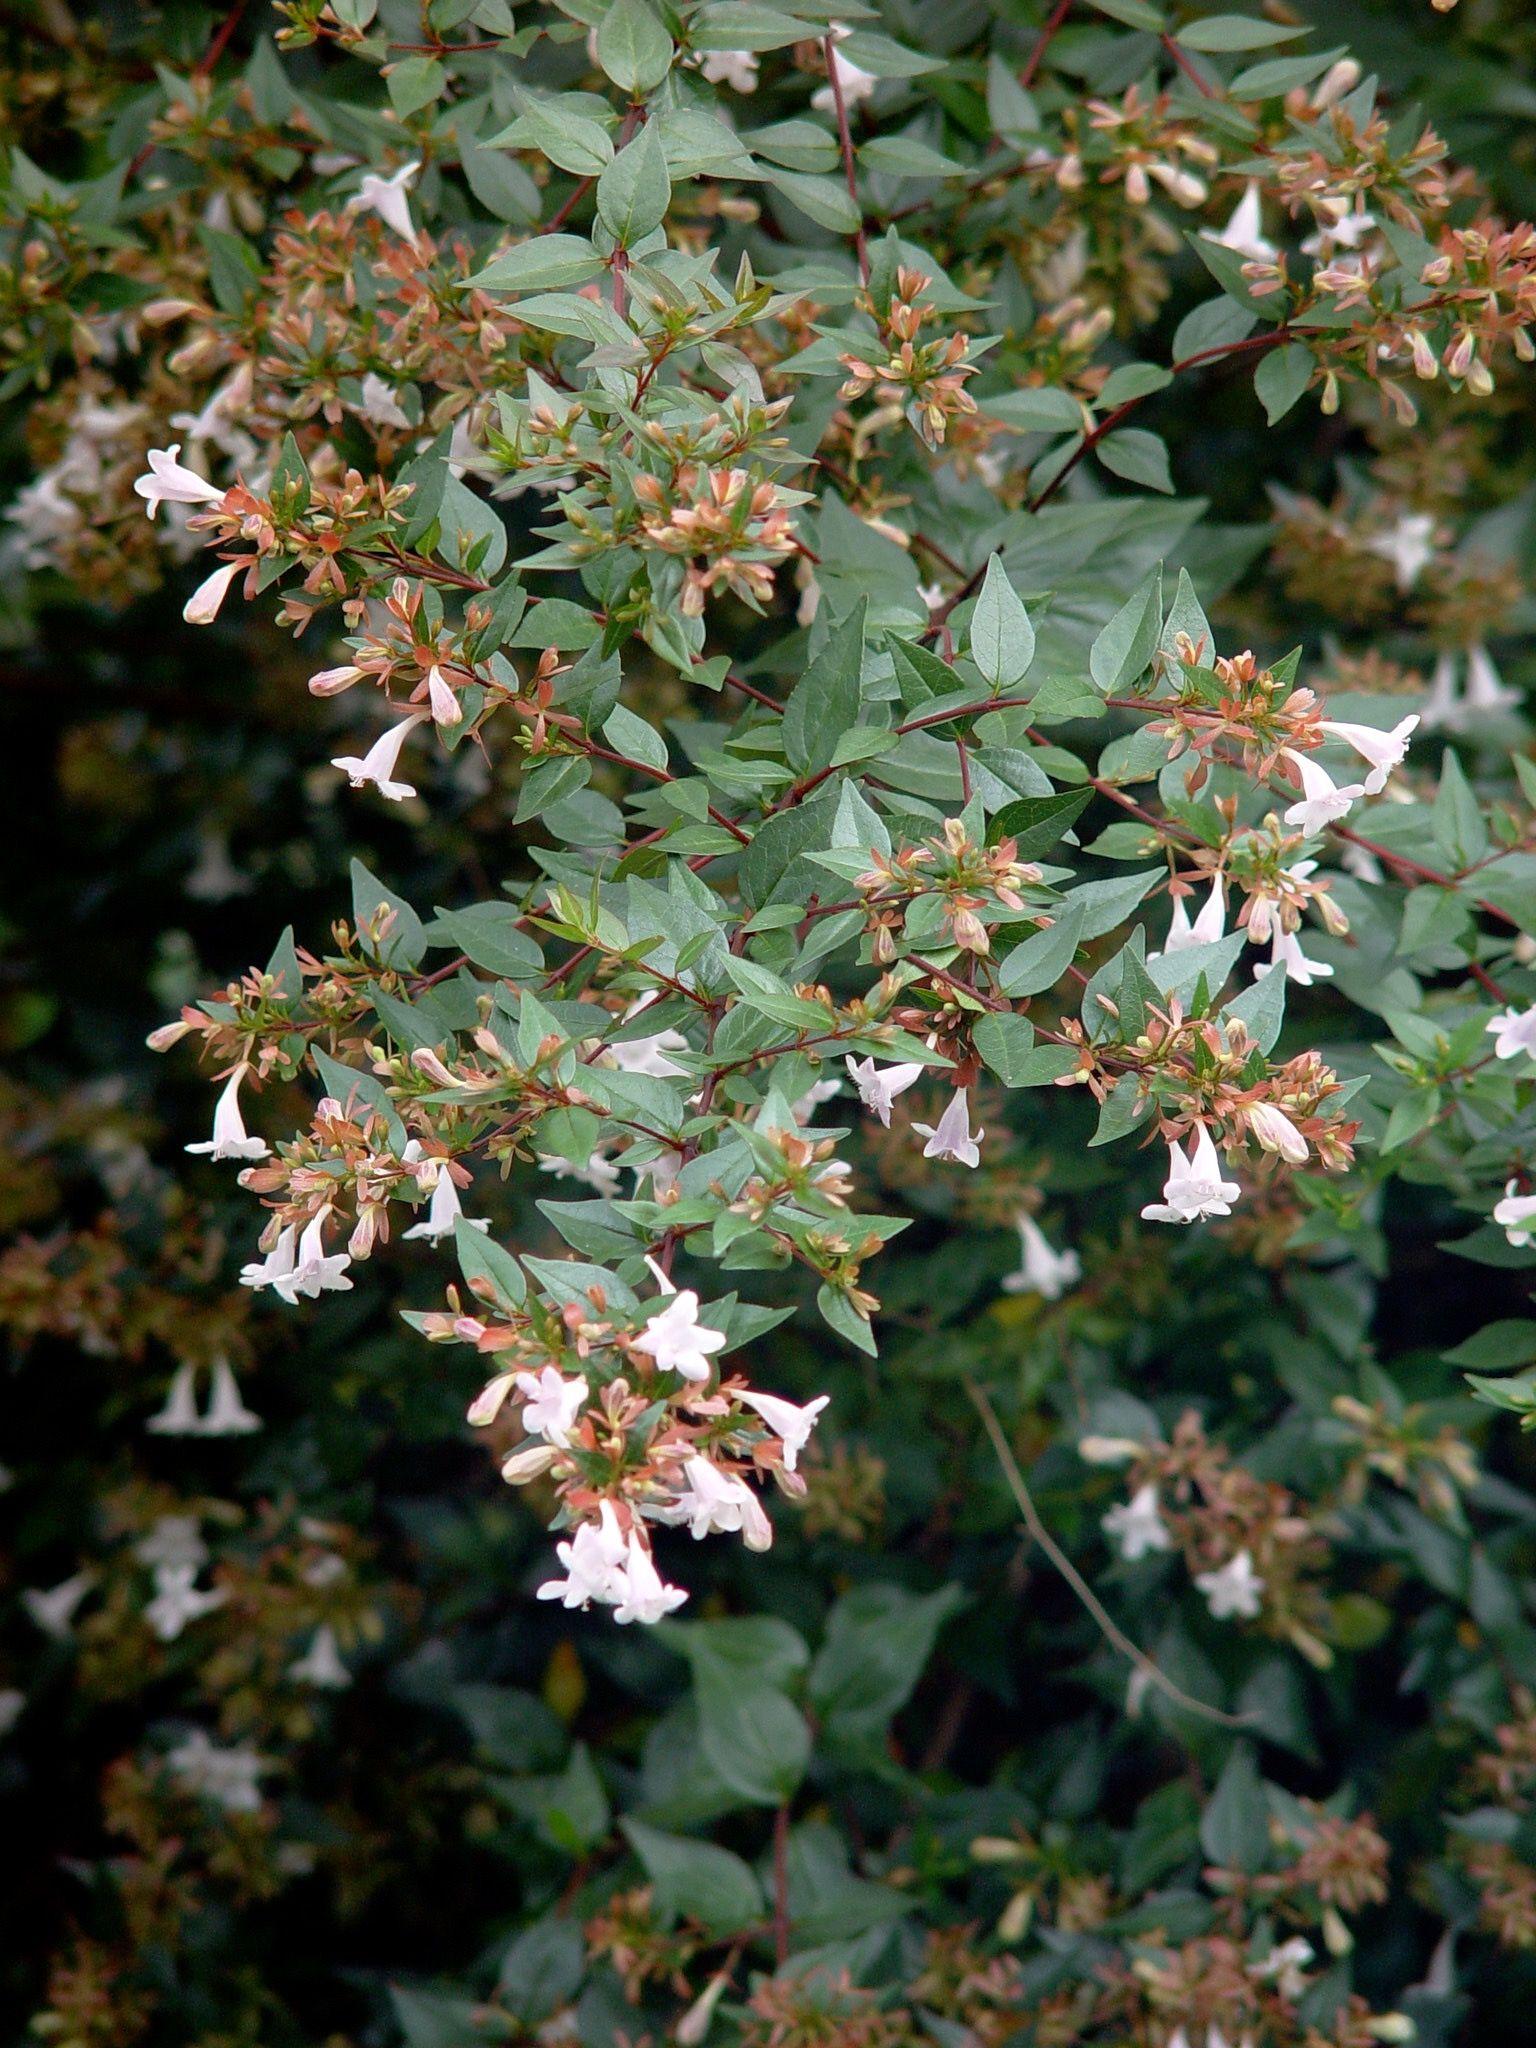 Abelia Grandiflora Lovely Arching Shrubdelicate White Flowers